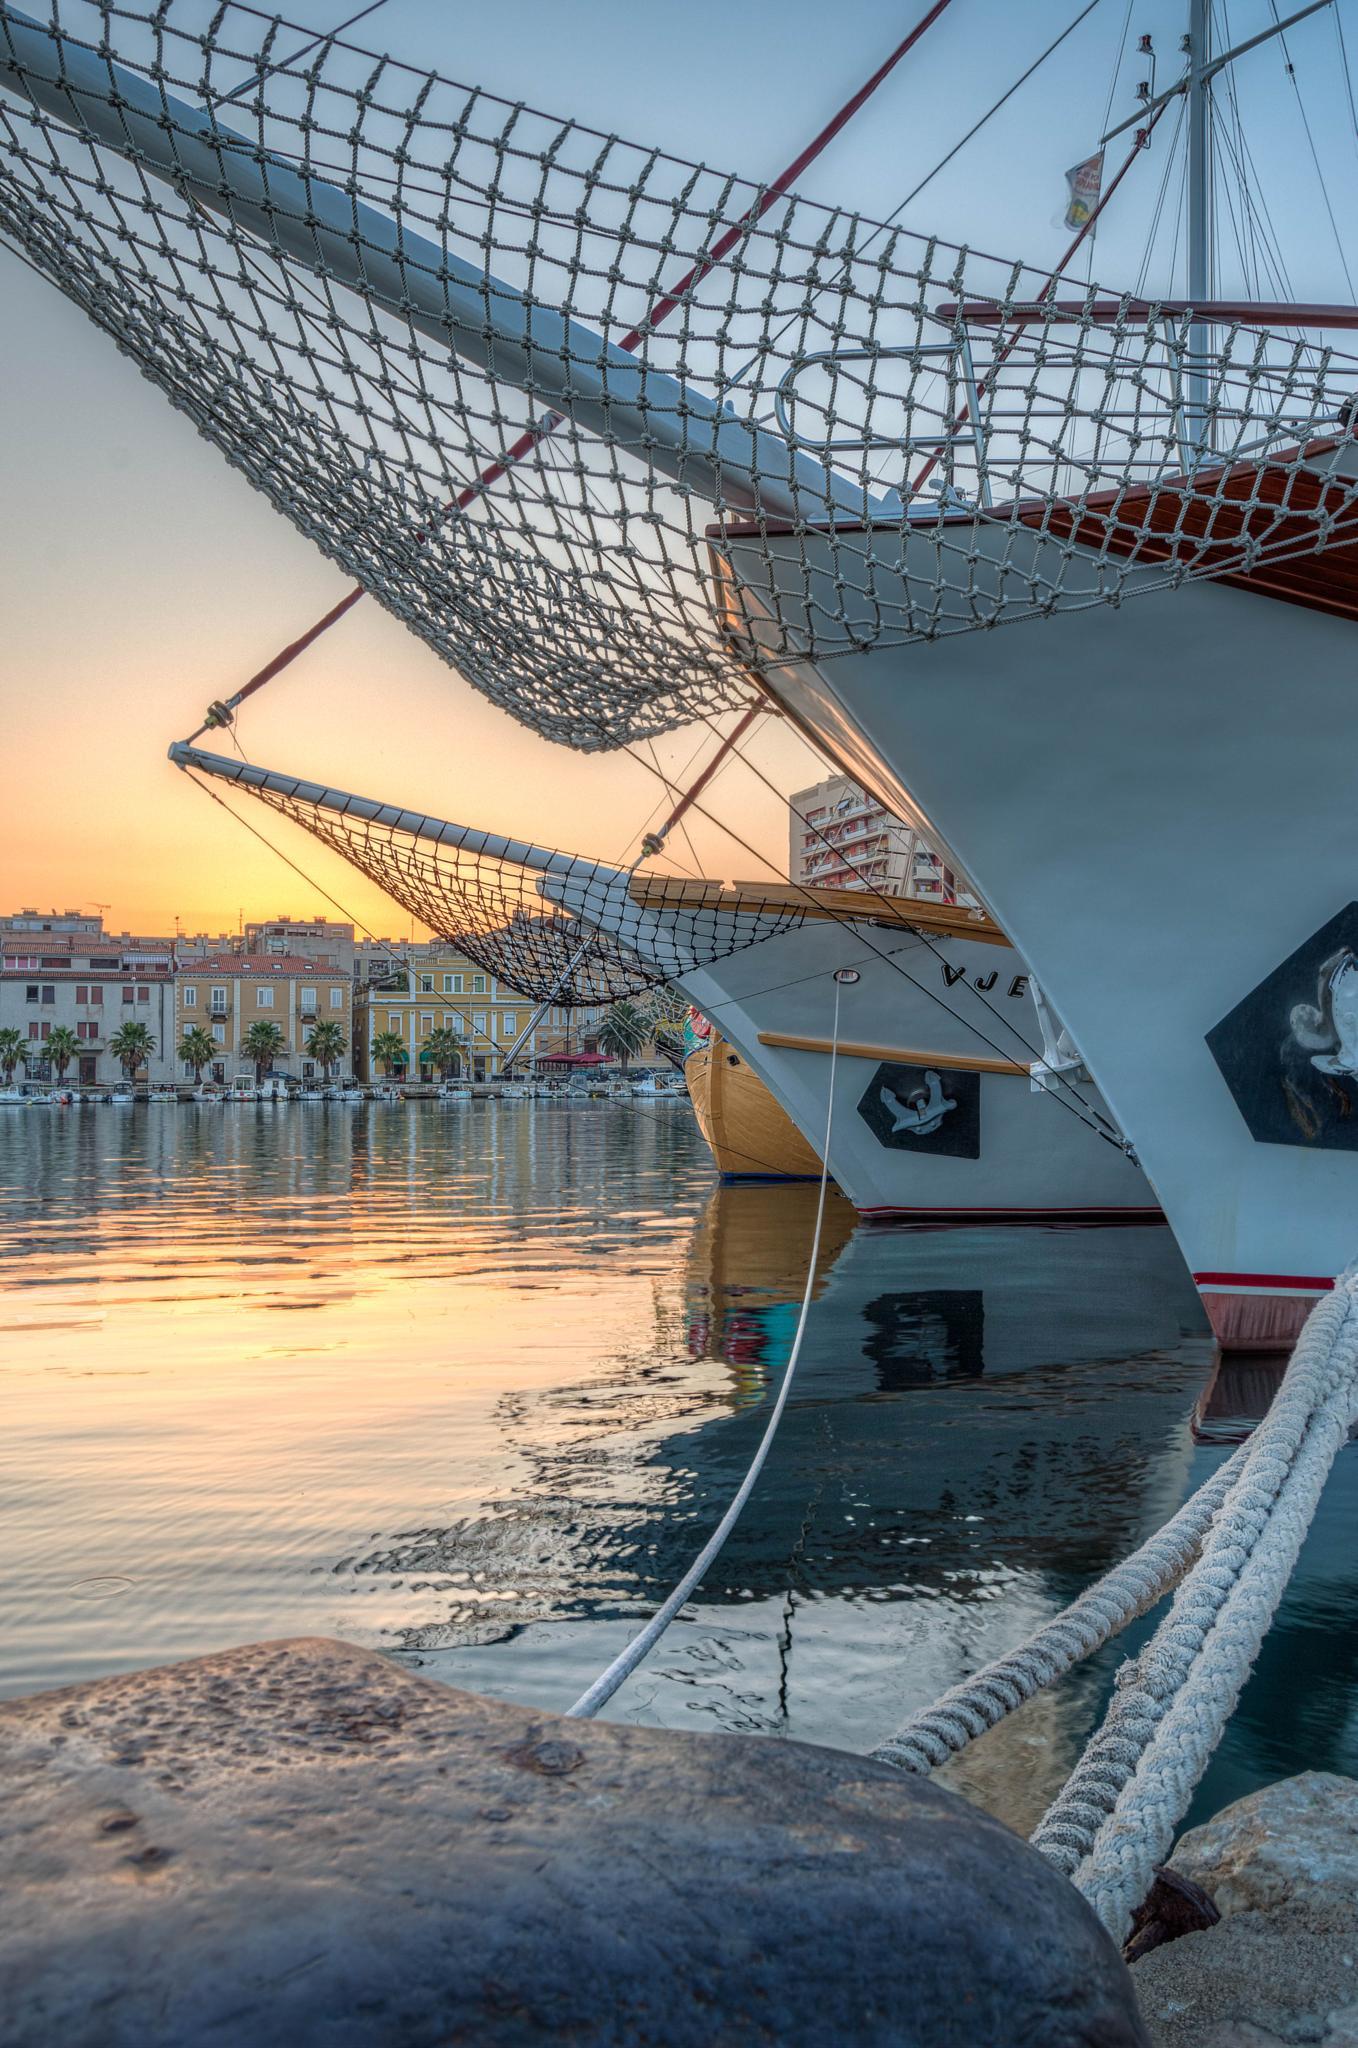 Sunrise in Zadar by Pixmil Photography